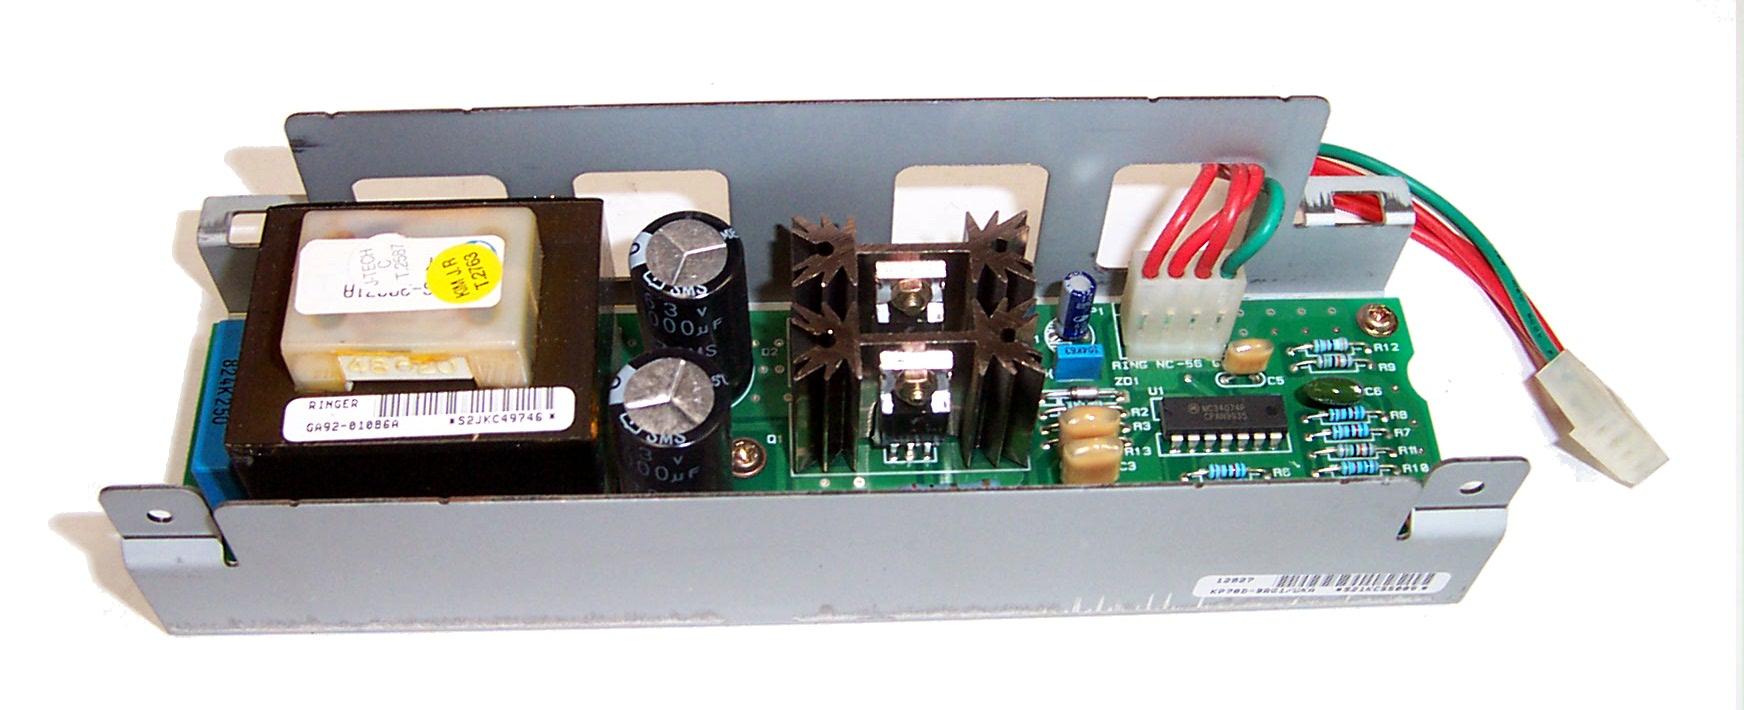 Samsung GA92-01086A DCS Compact II Ringer C/S